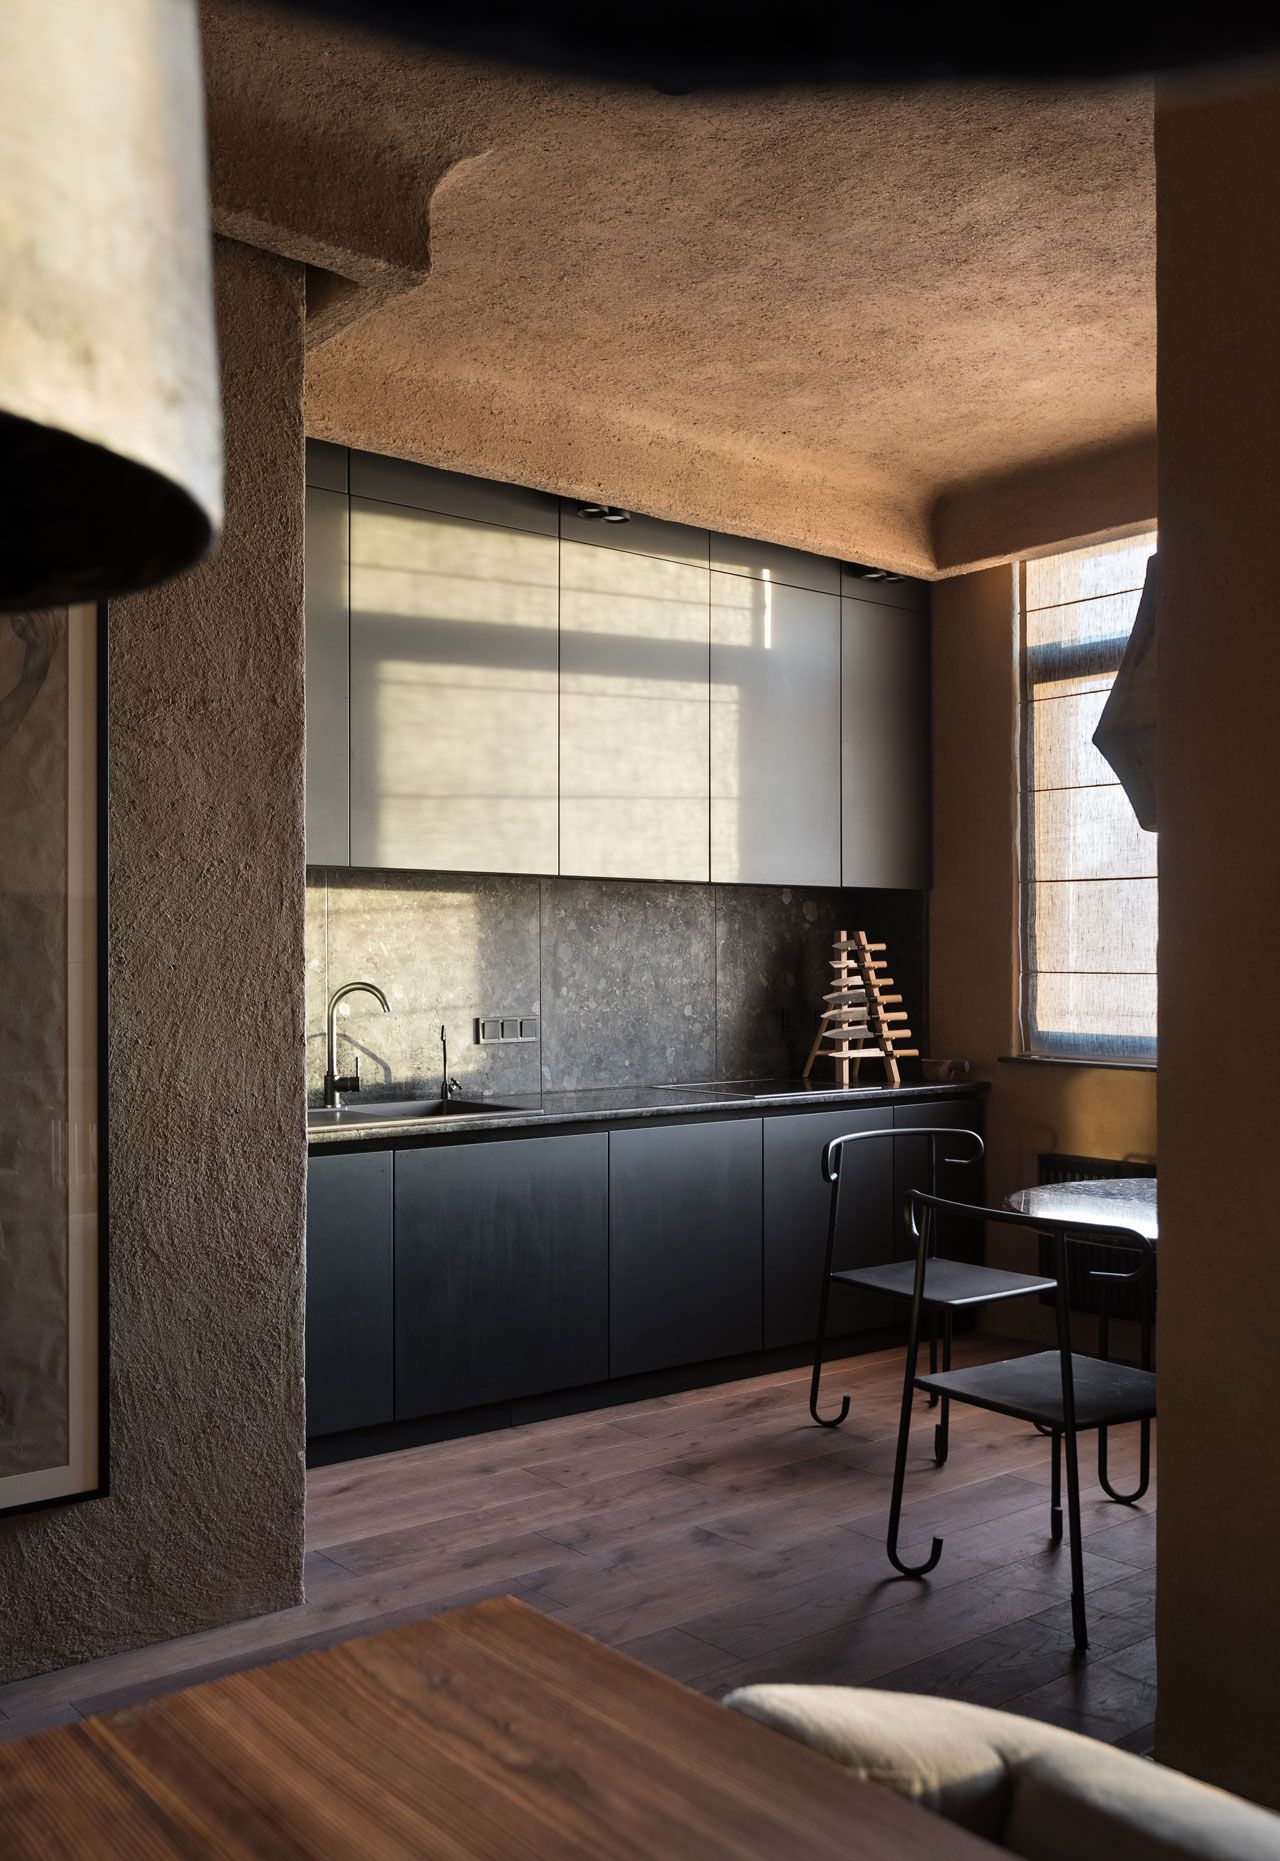 Architecture Wabi Sabi Apartment Sergey Makhno 3 Japanese minimalism Wabi sabi